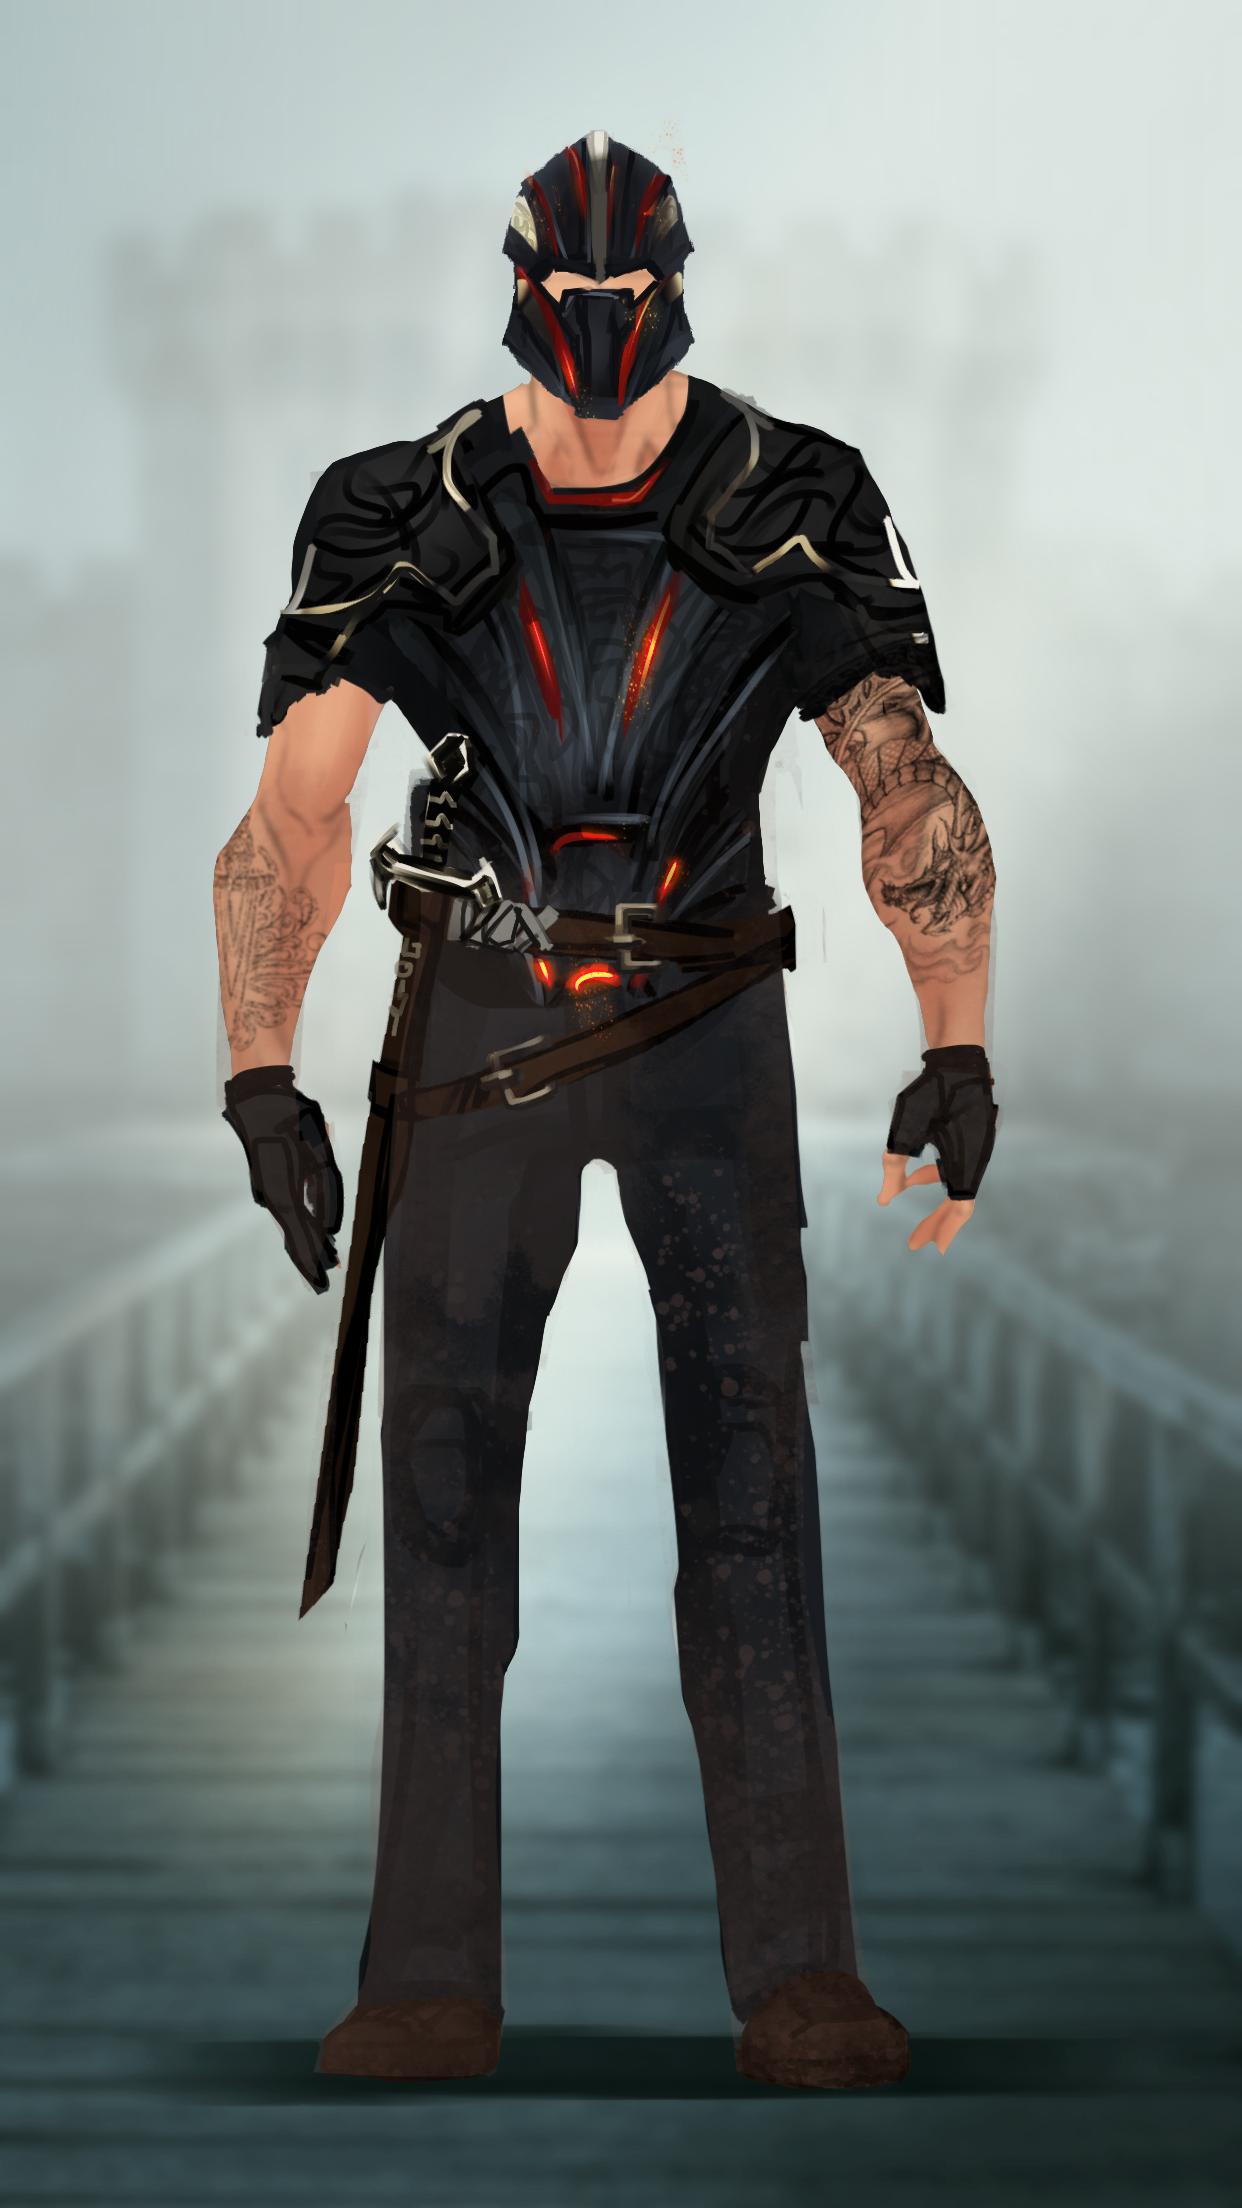 Black Knight Jacketless Mcu Quick Redesign Marvel And Dc Characters Blackest Knight Superhero Art